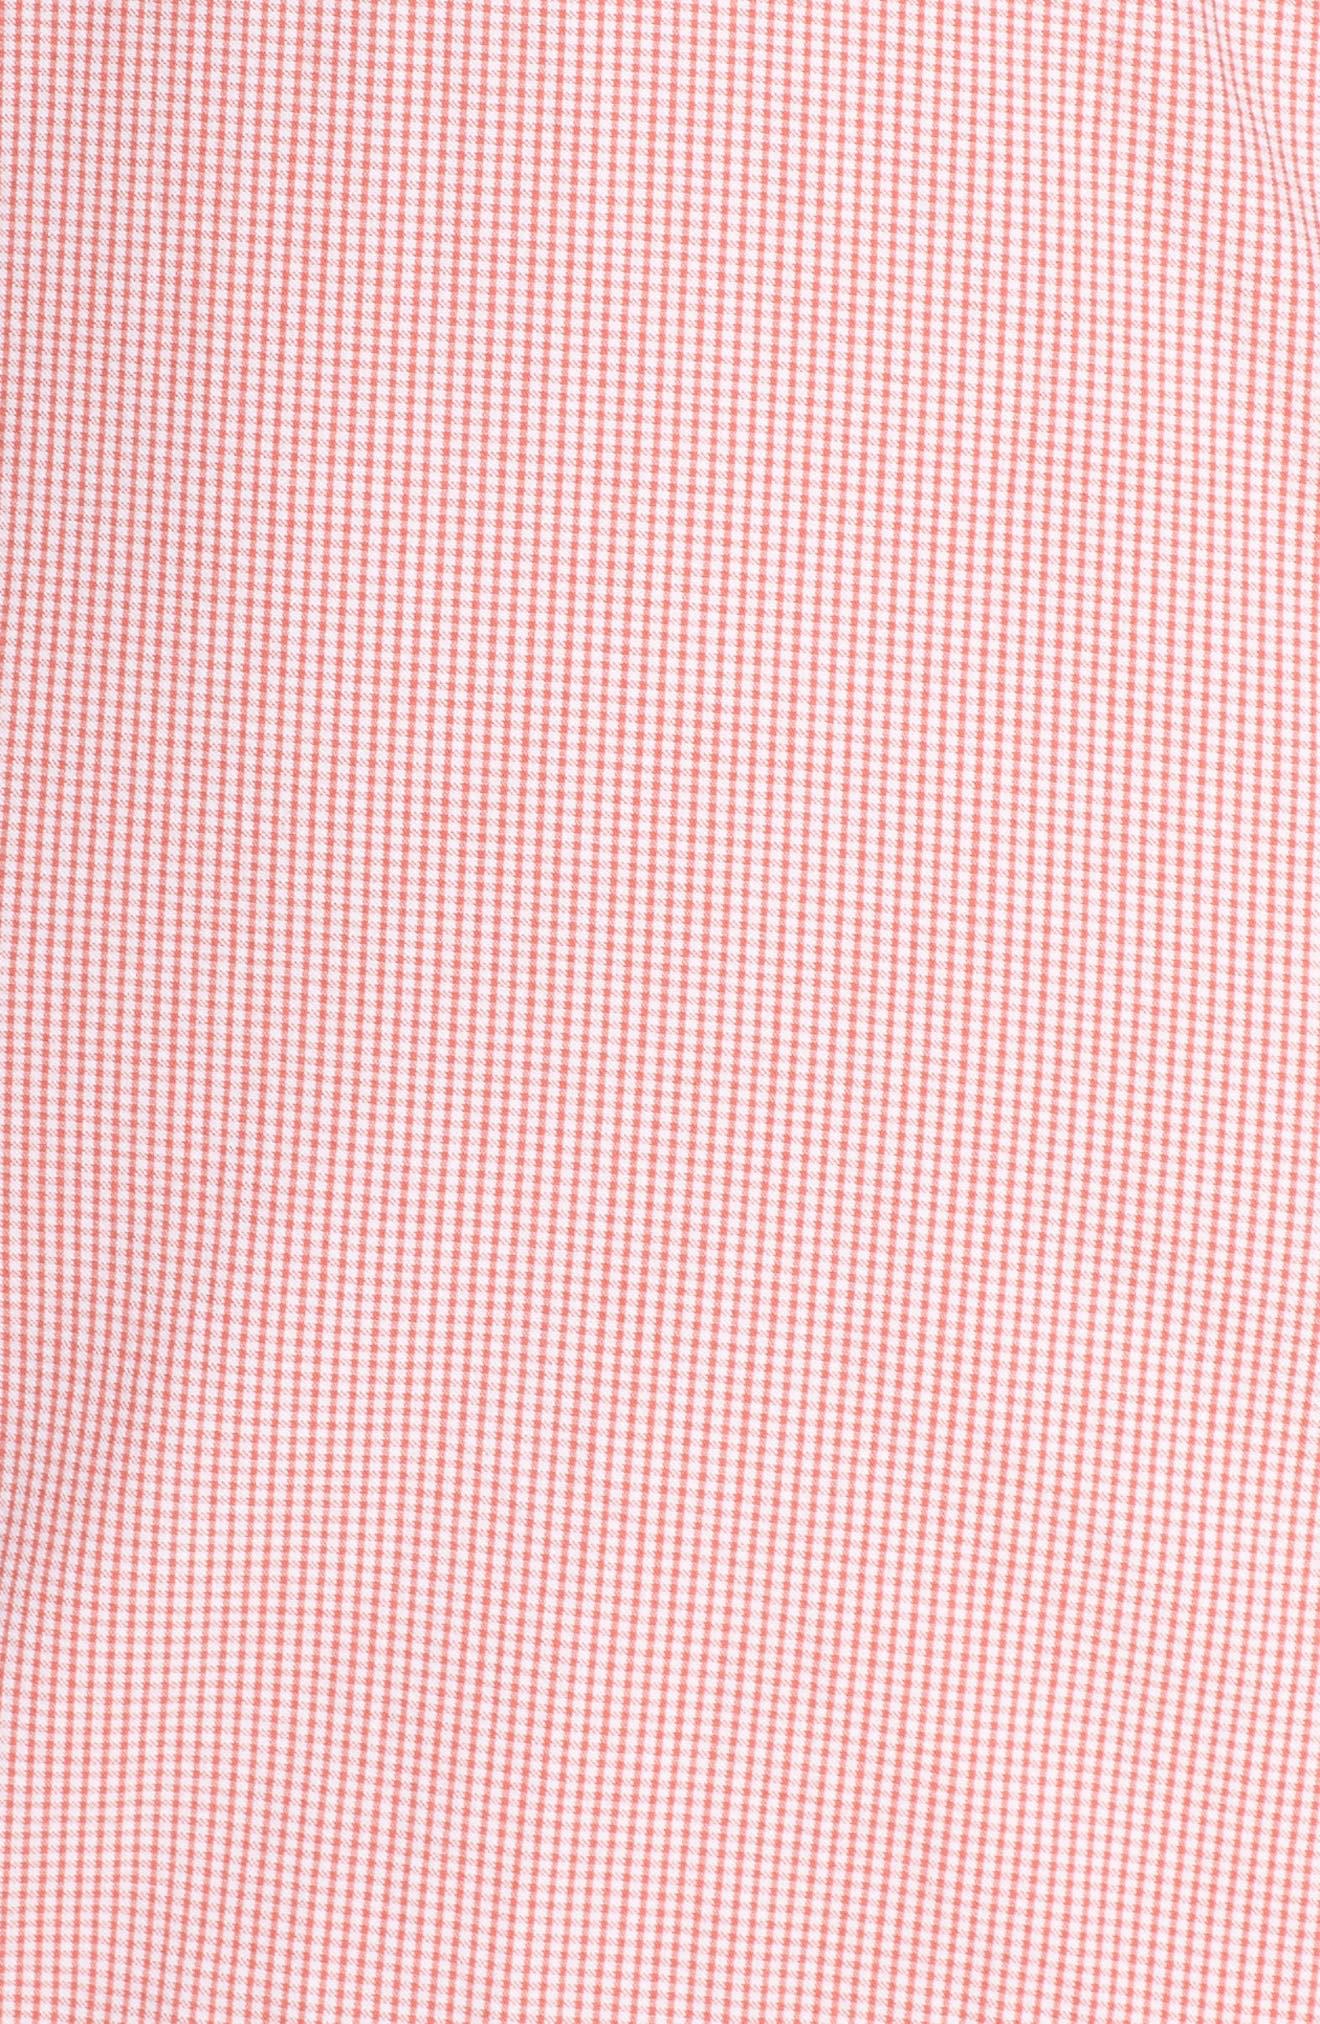 Ruffle V-Neck Sheath Dress,                             Alternate thumbnail 6, color,